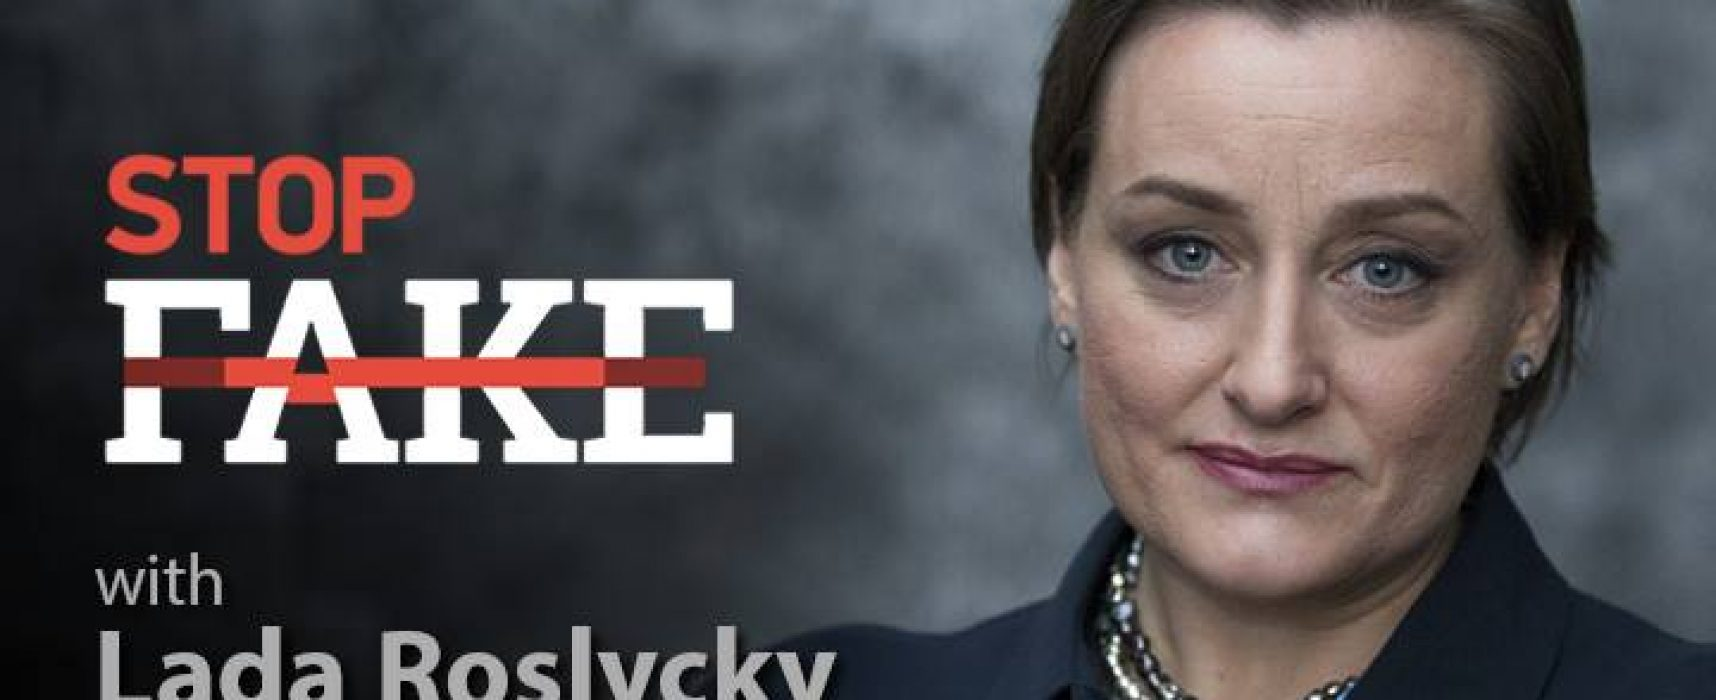 StopFakeNews #111 [Engels] met Lada Roslycky